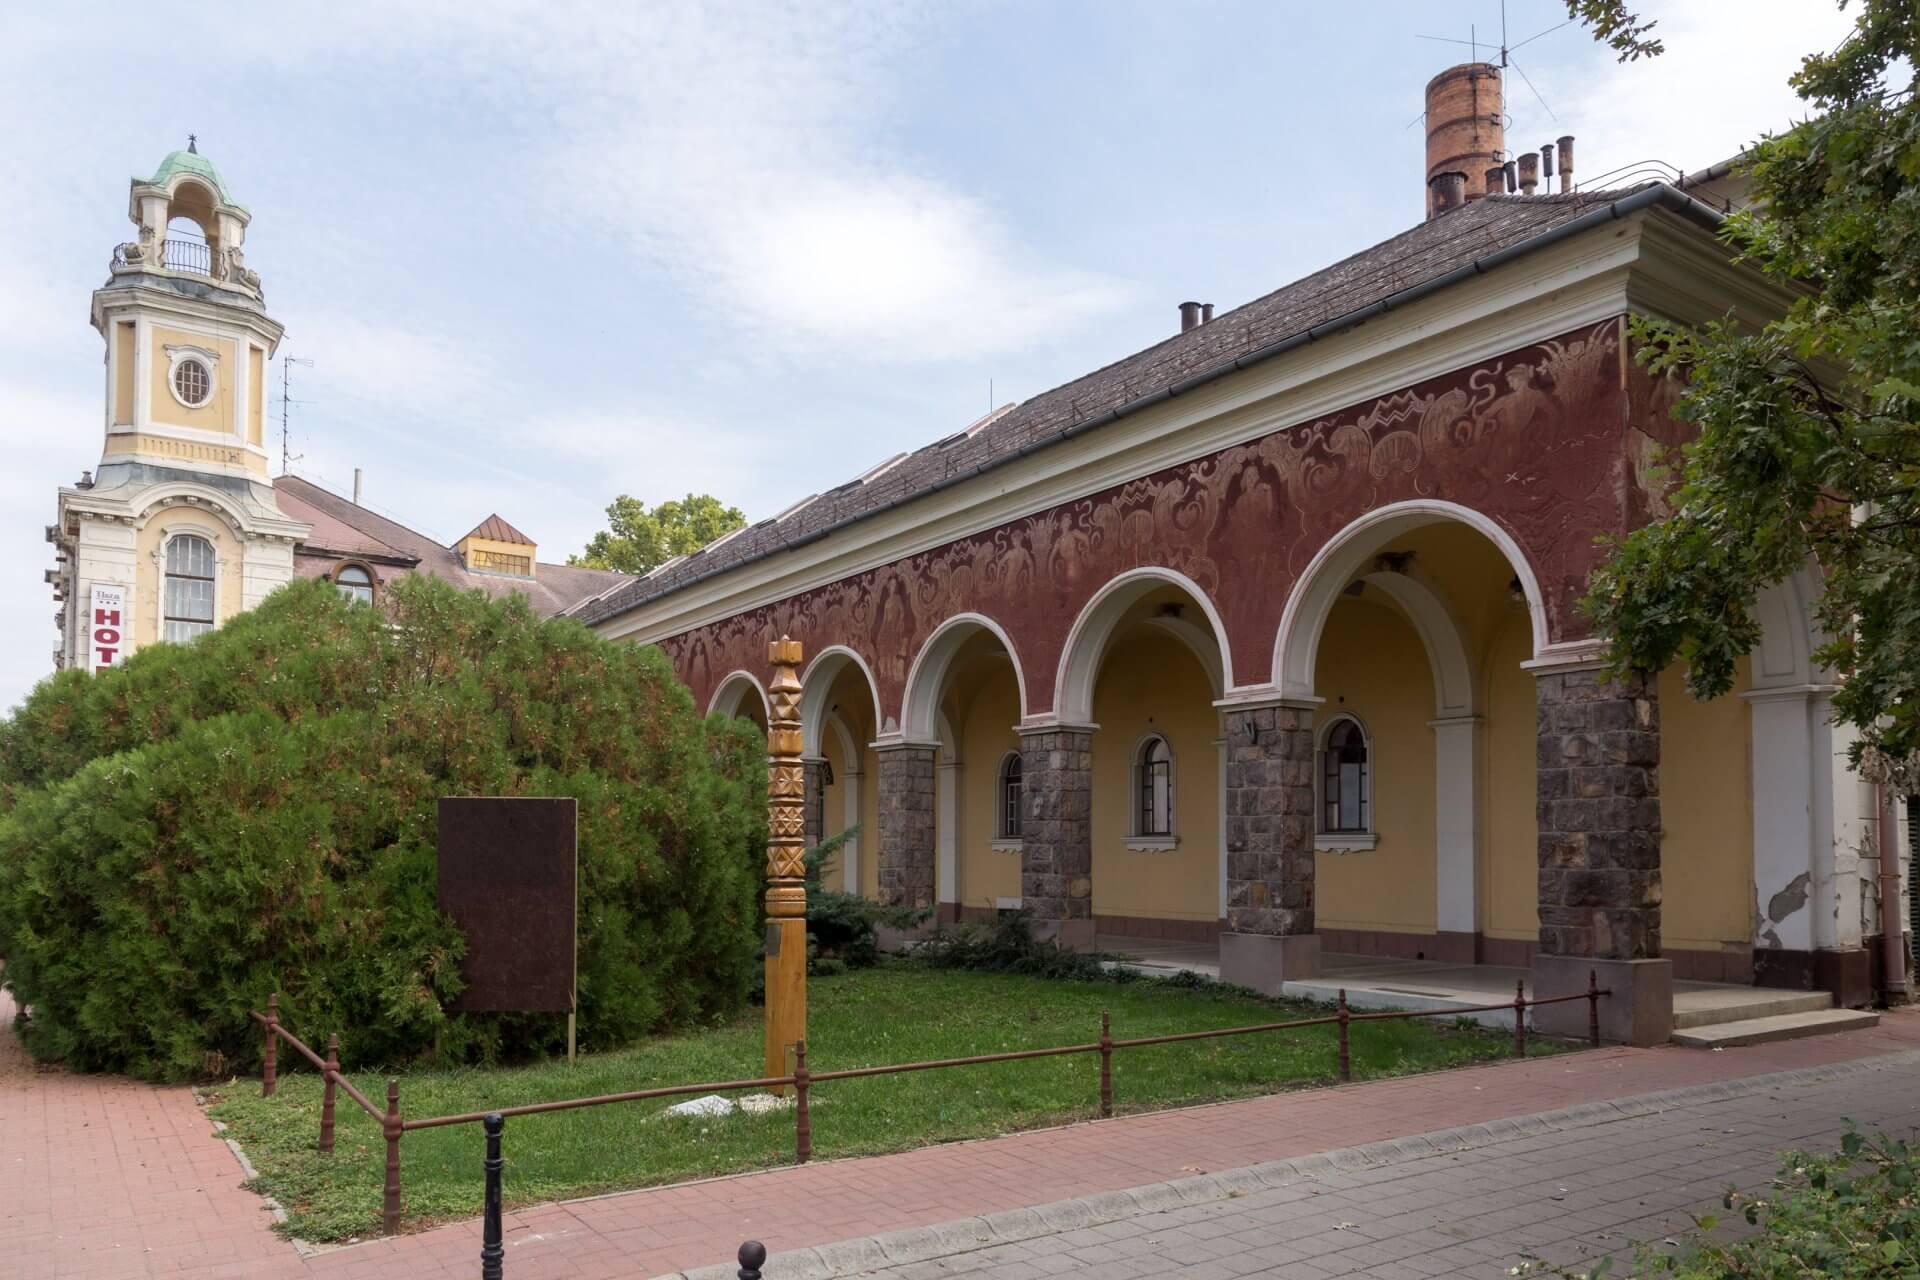 Tisza Hotel in Szolnok